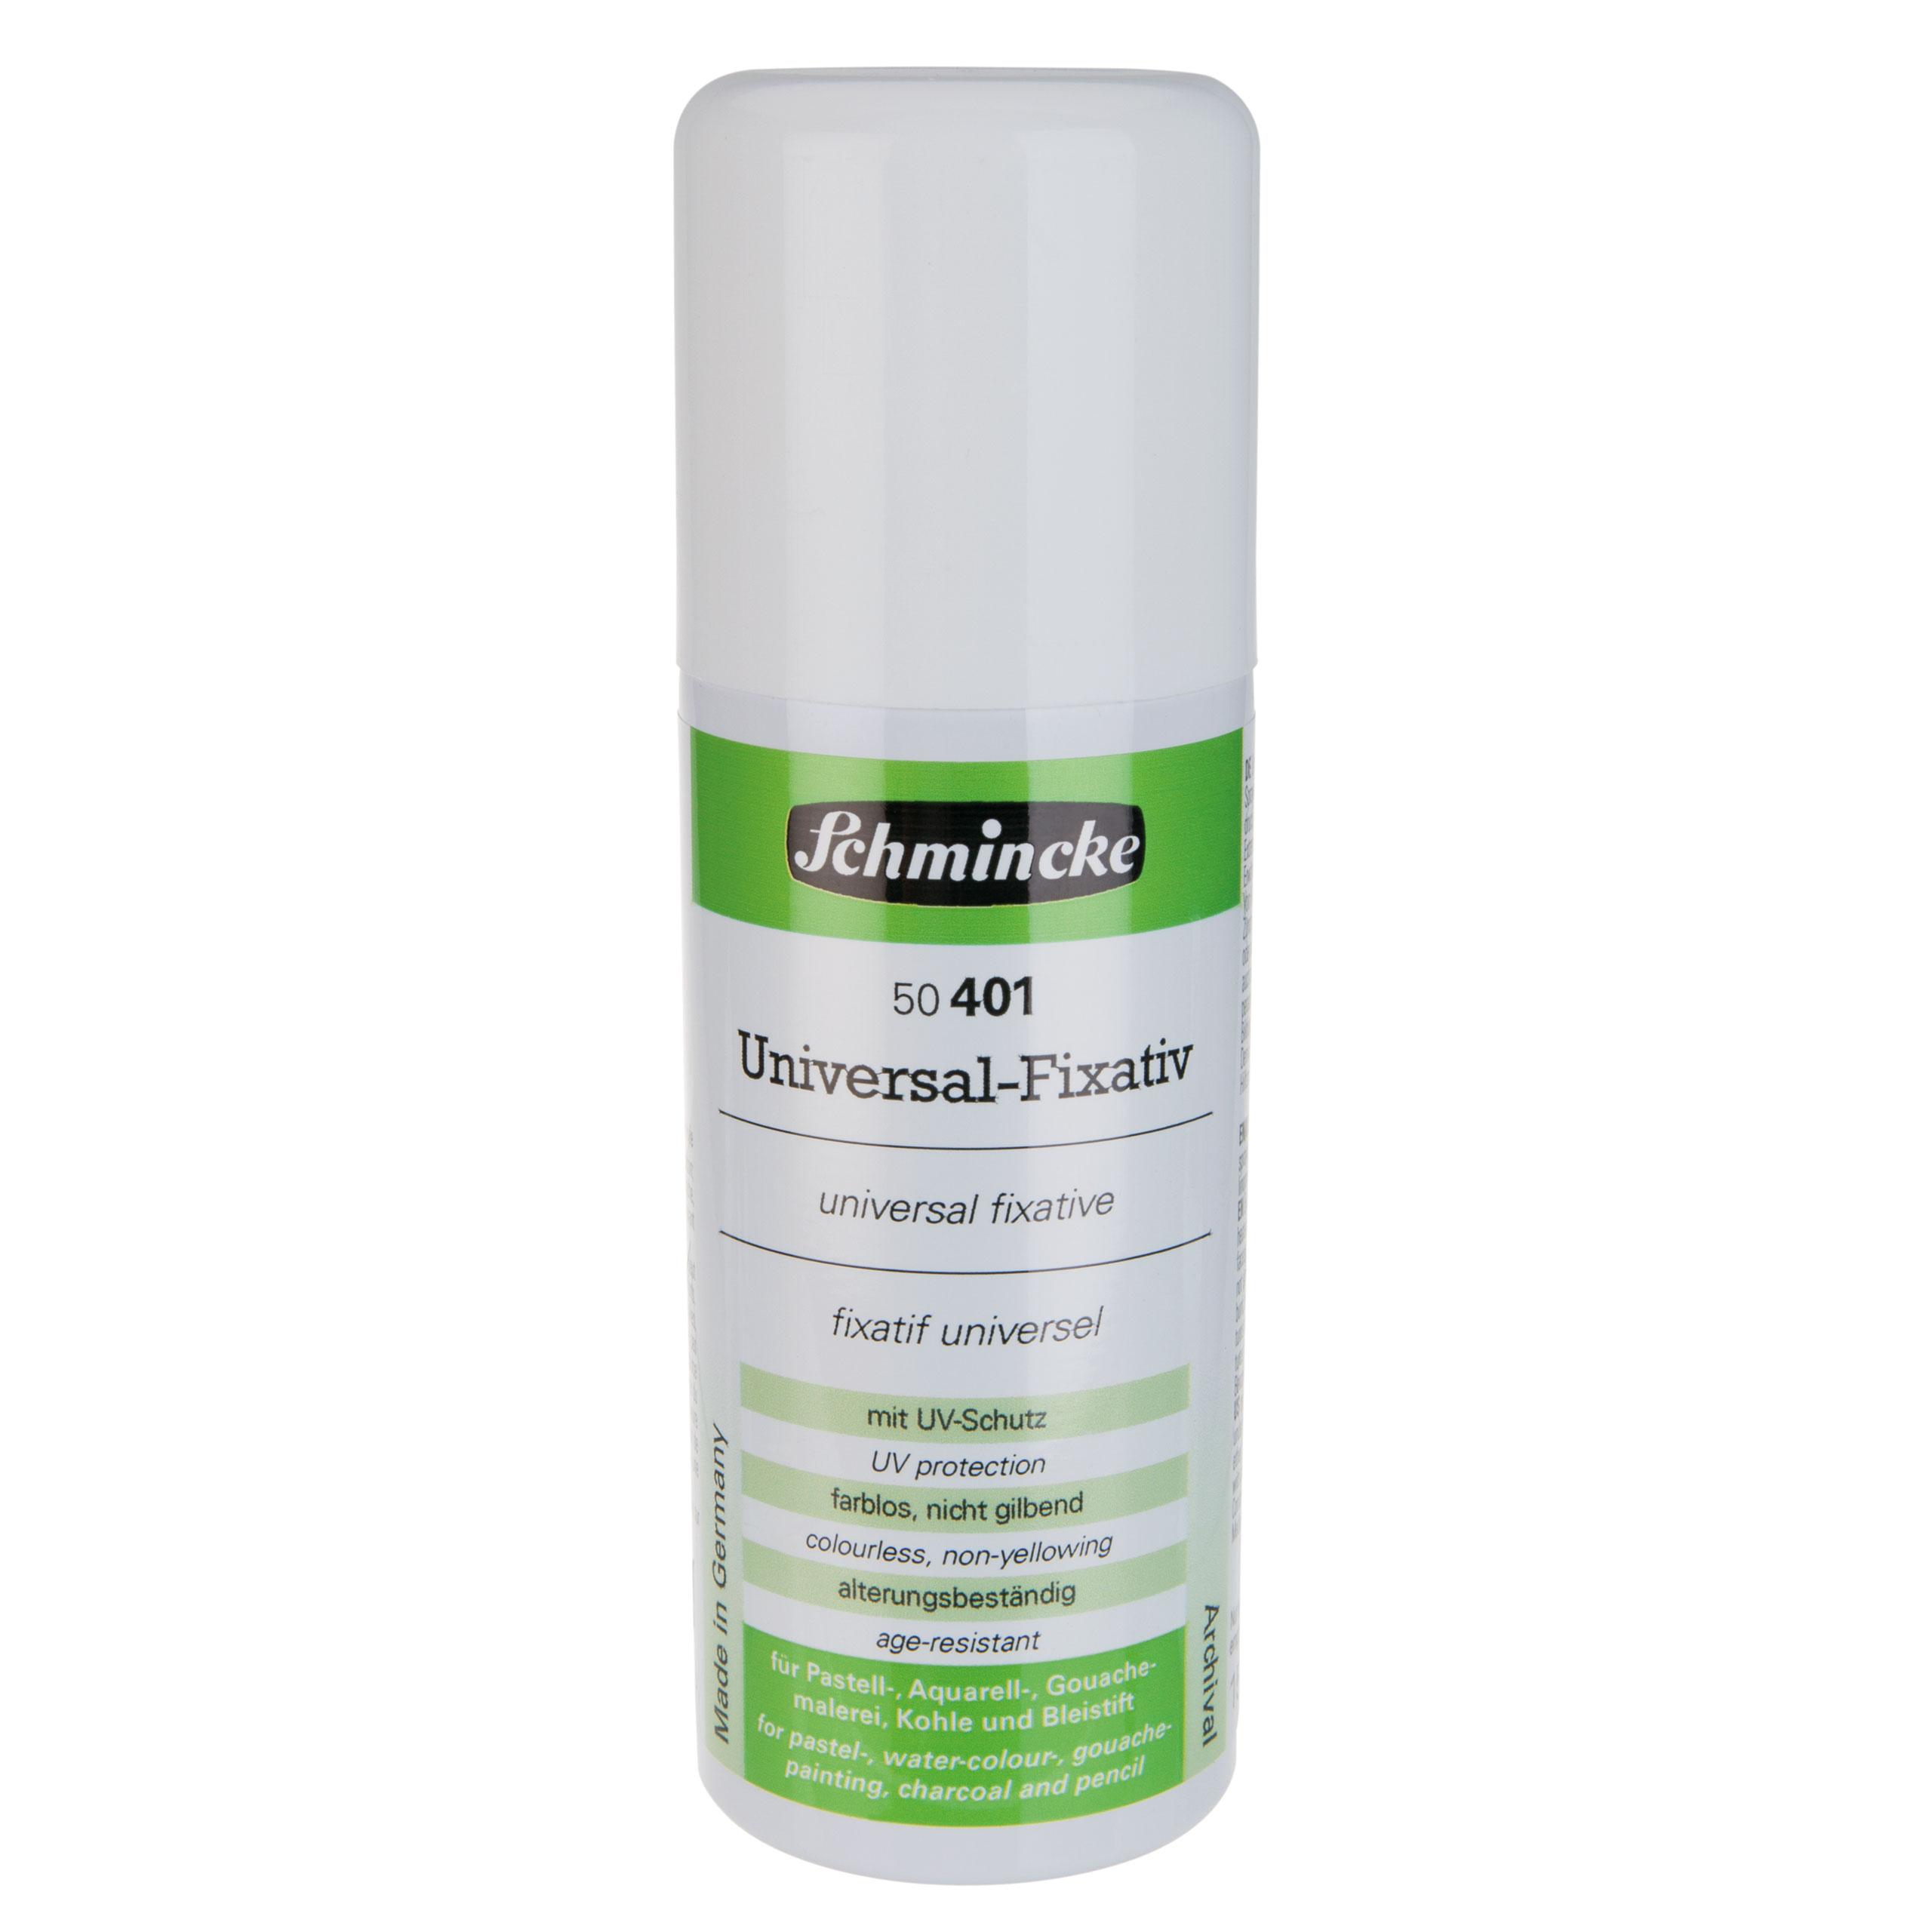 Universal-Fixativ AEROSPRAY - 150ml Hilfsmittel Schmincke 50 401 052